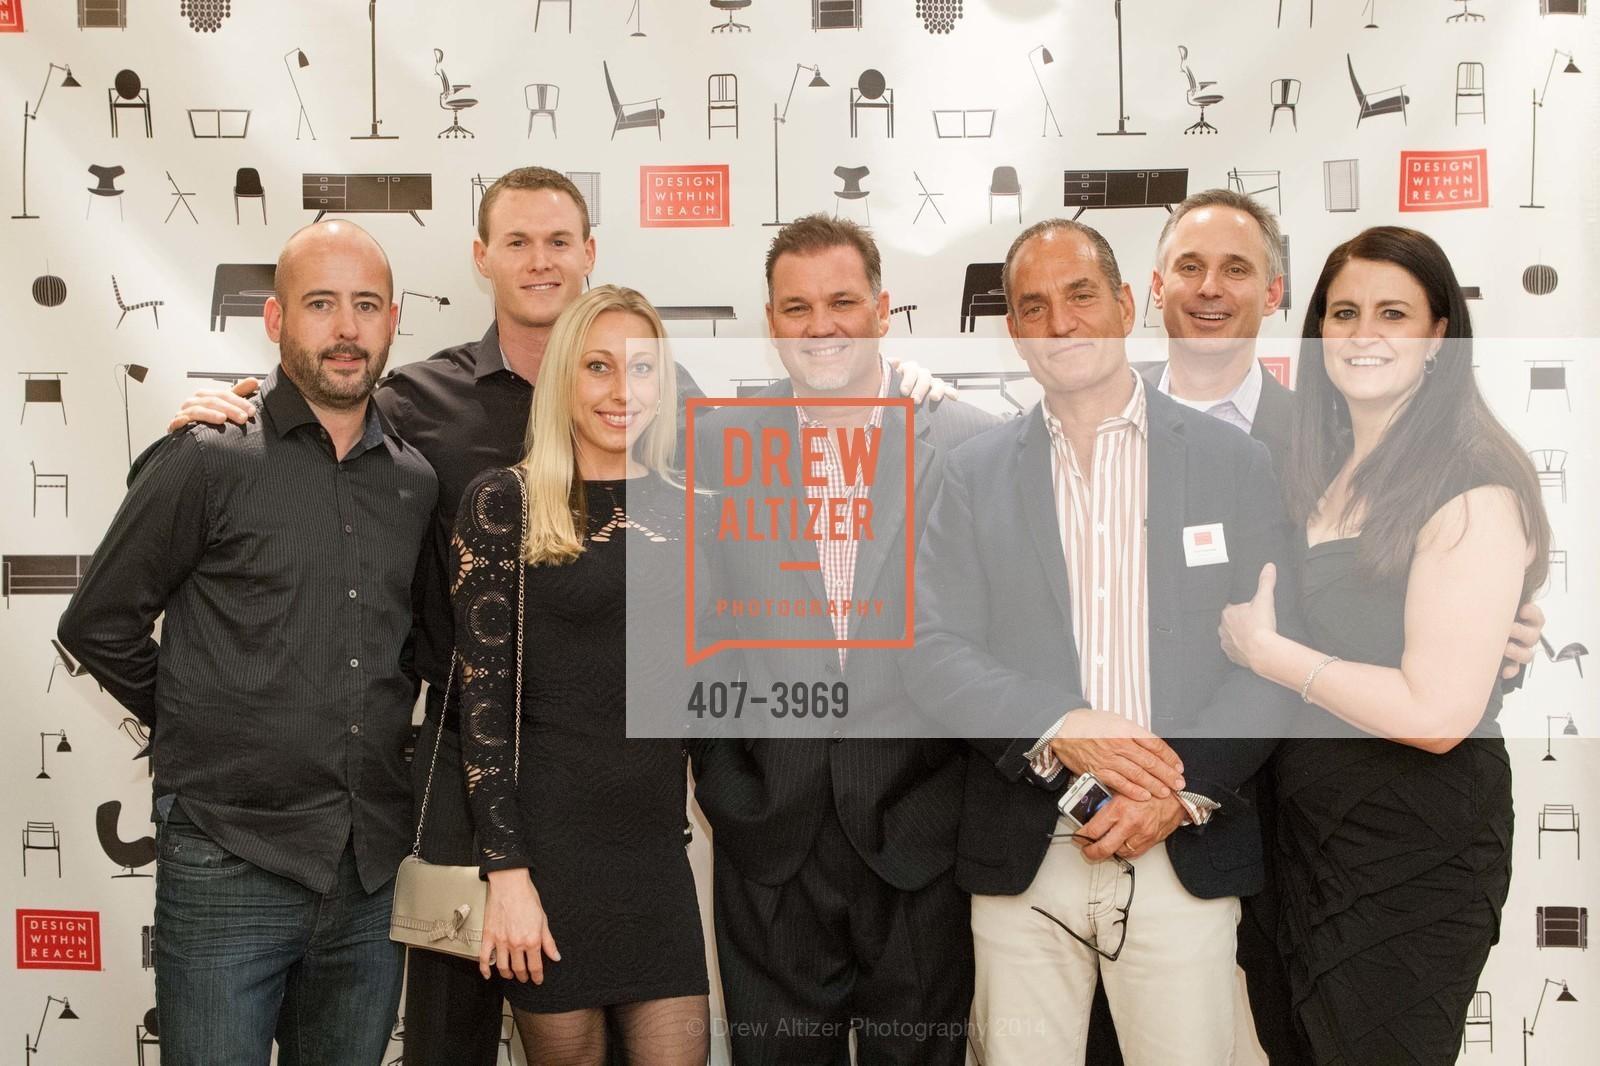 Seamus Canning, James Doherty, Donna Steadman, Cole Haynes, Evan Berendweig, Photo #407-3969